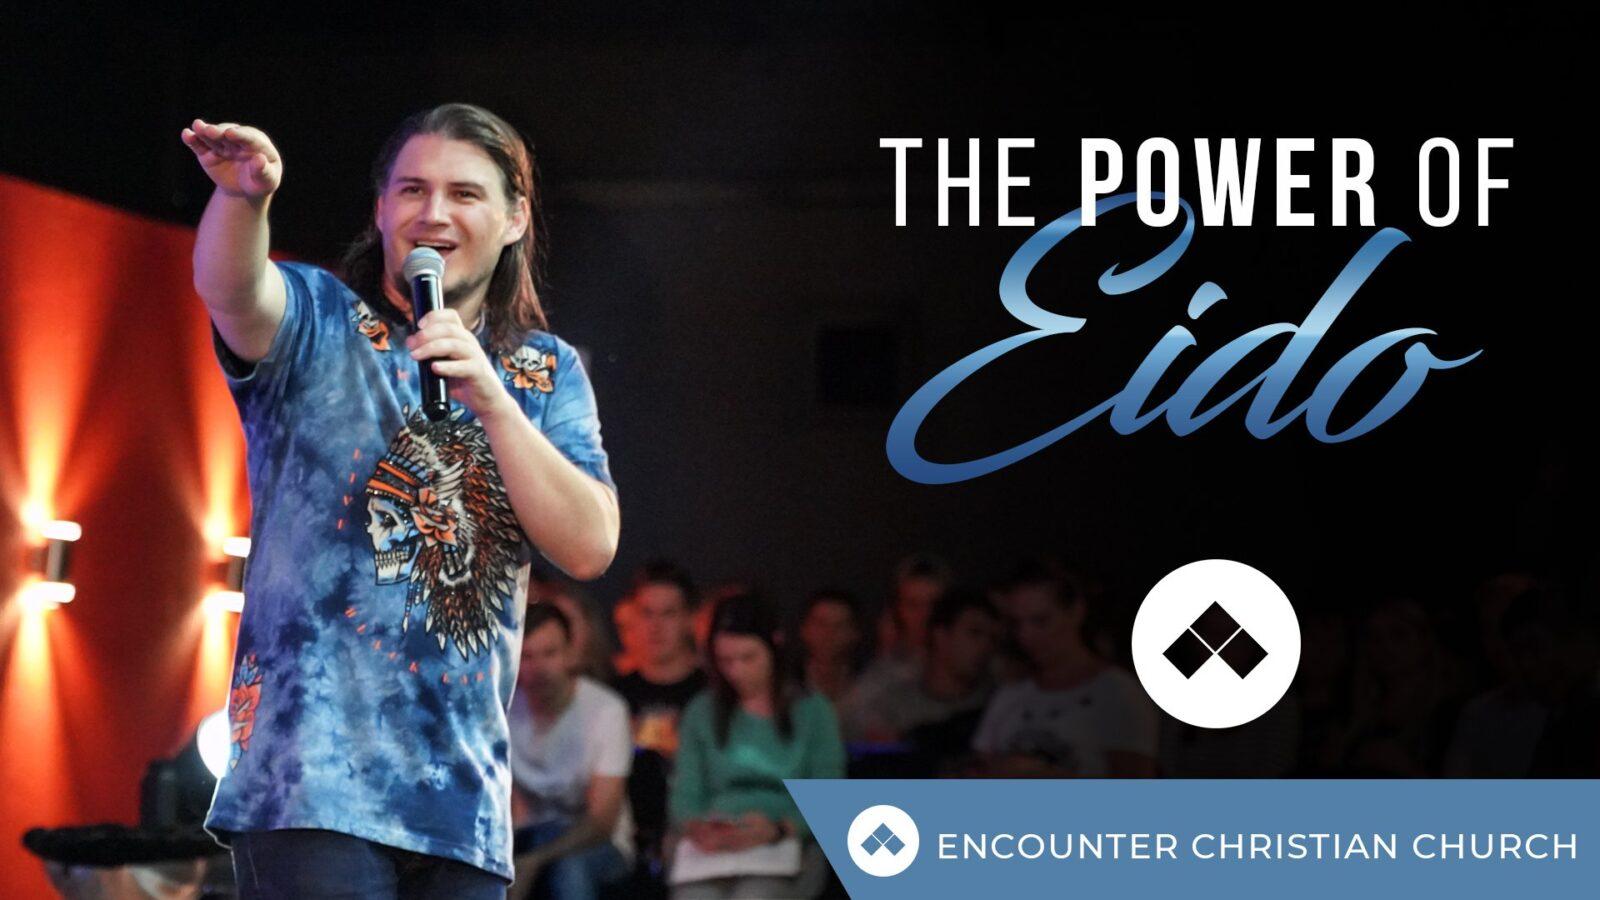 The Power Of Eido